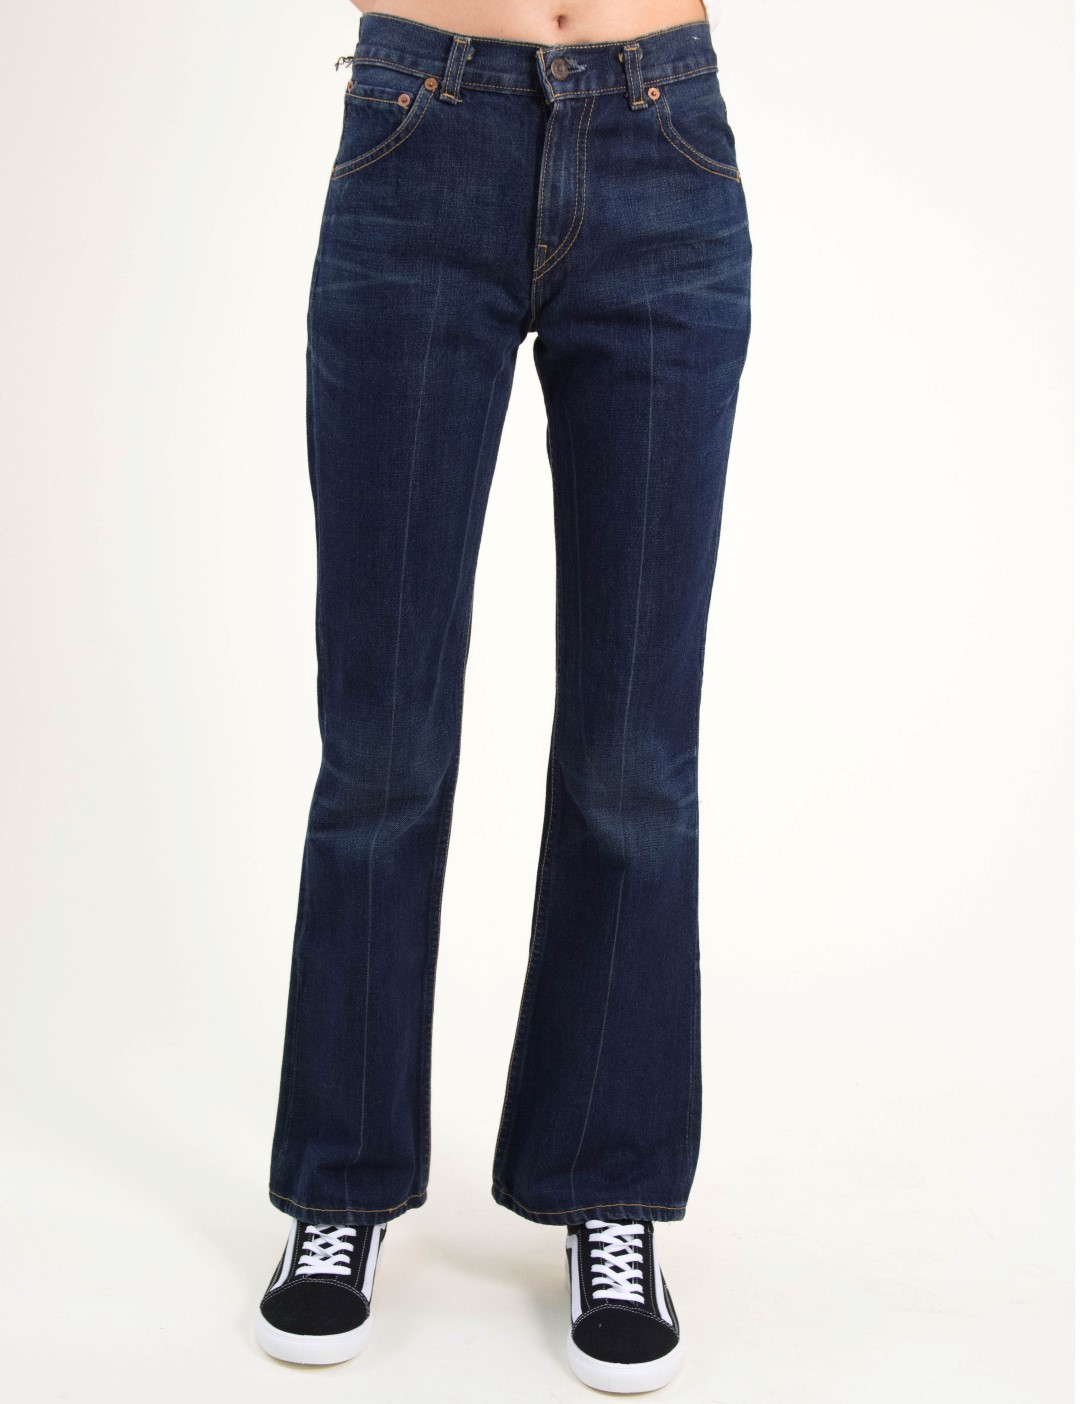 5715862fee0 Jeans | Γυναικεία Παντελόνια (Ταξινόμηση: Δημοφιλέστερα) | Σελίδα 3 ...